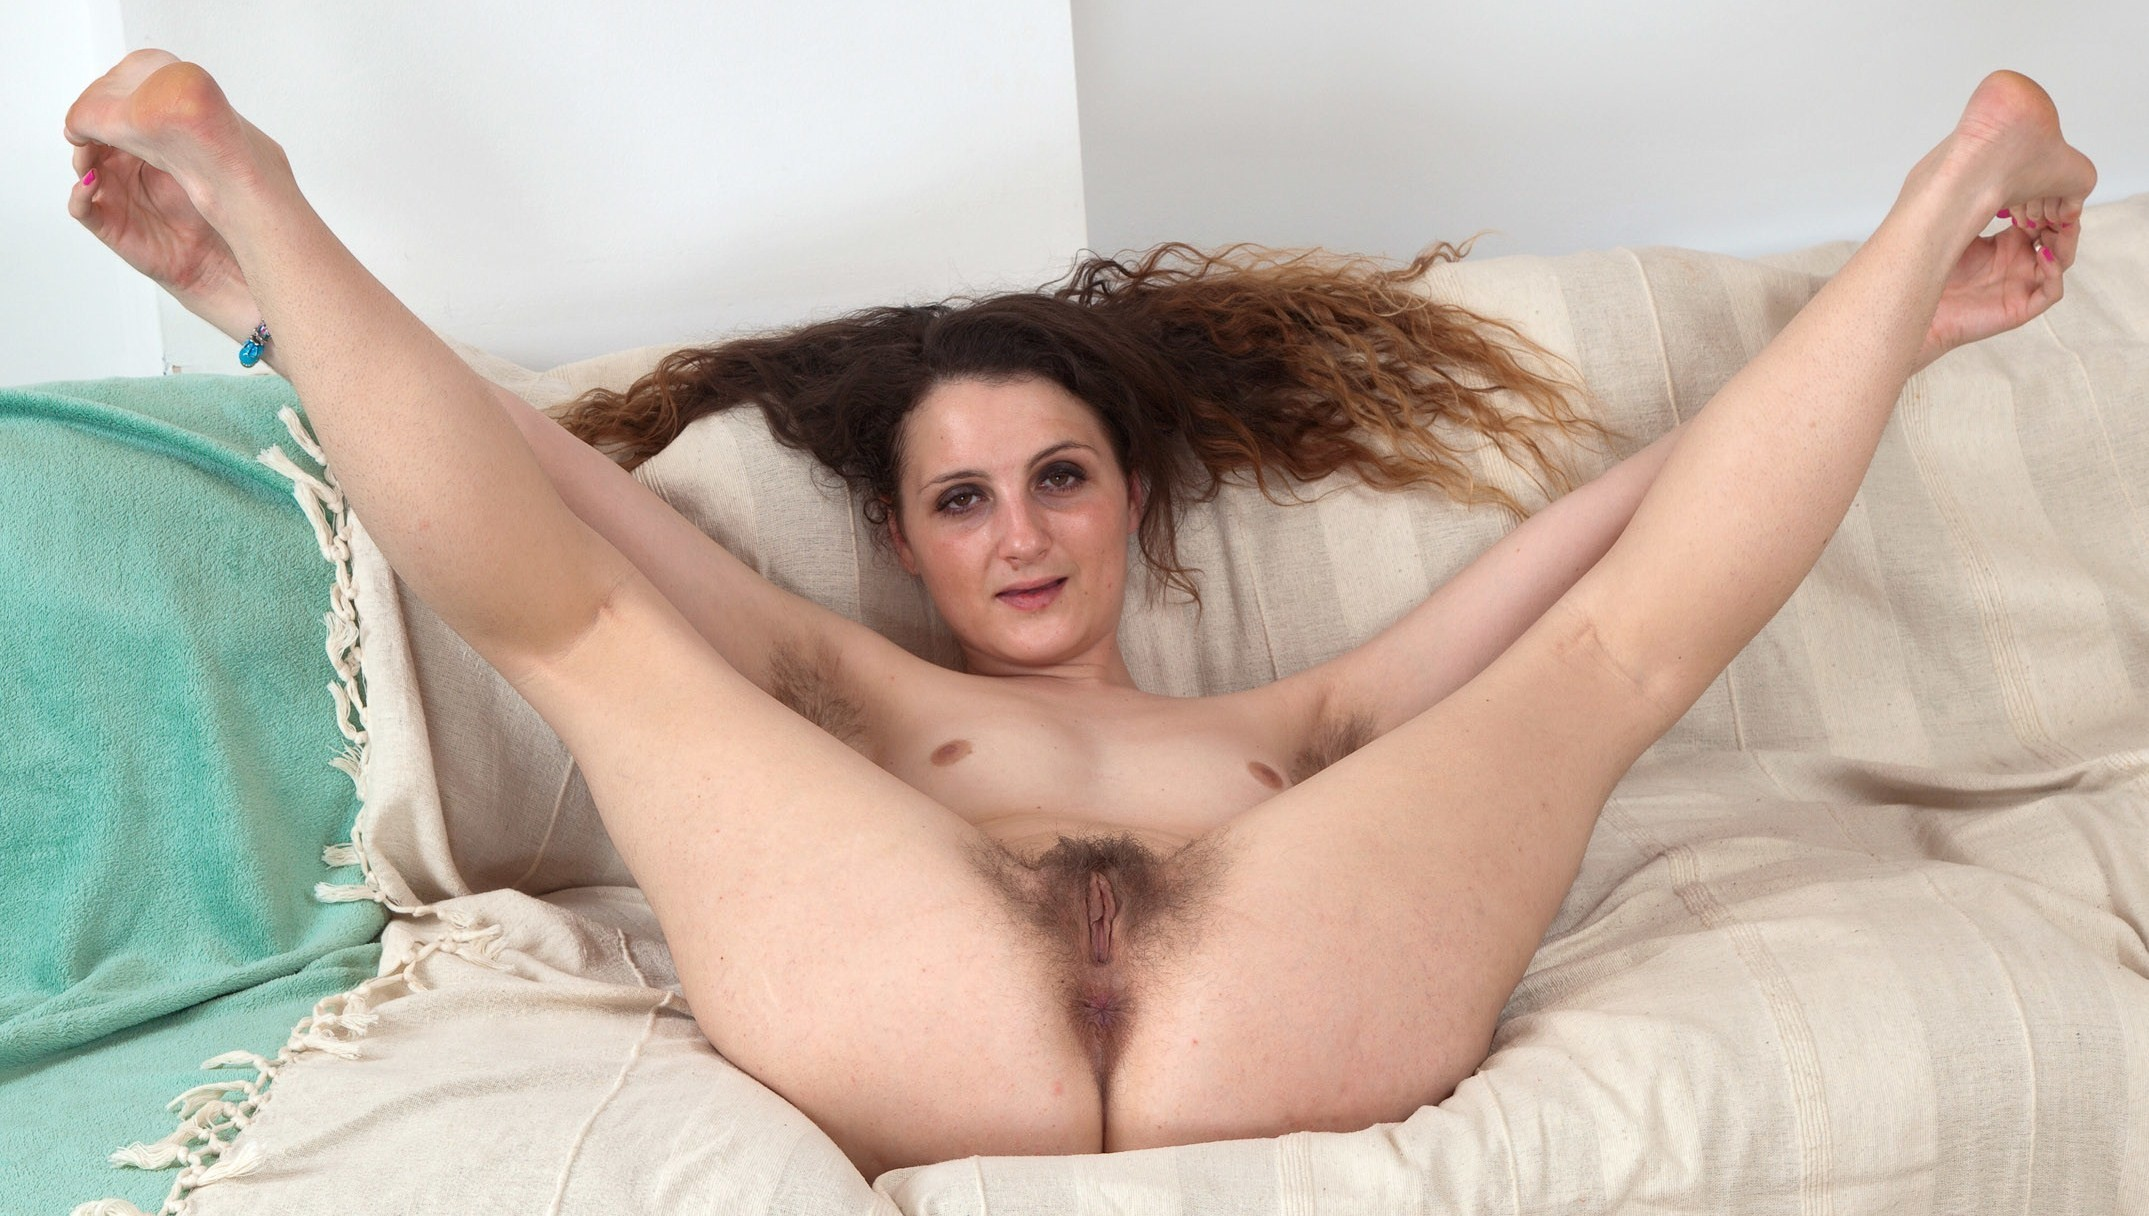 Волосатые широко разводят ноги — pic 8